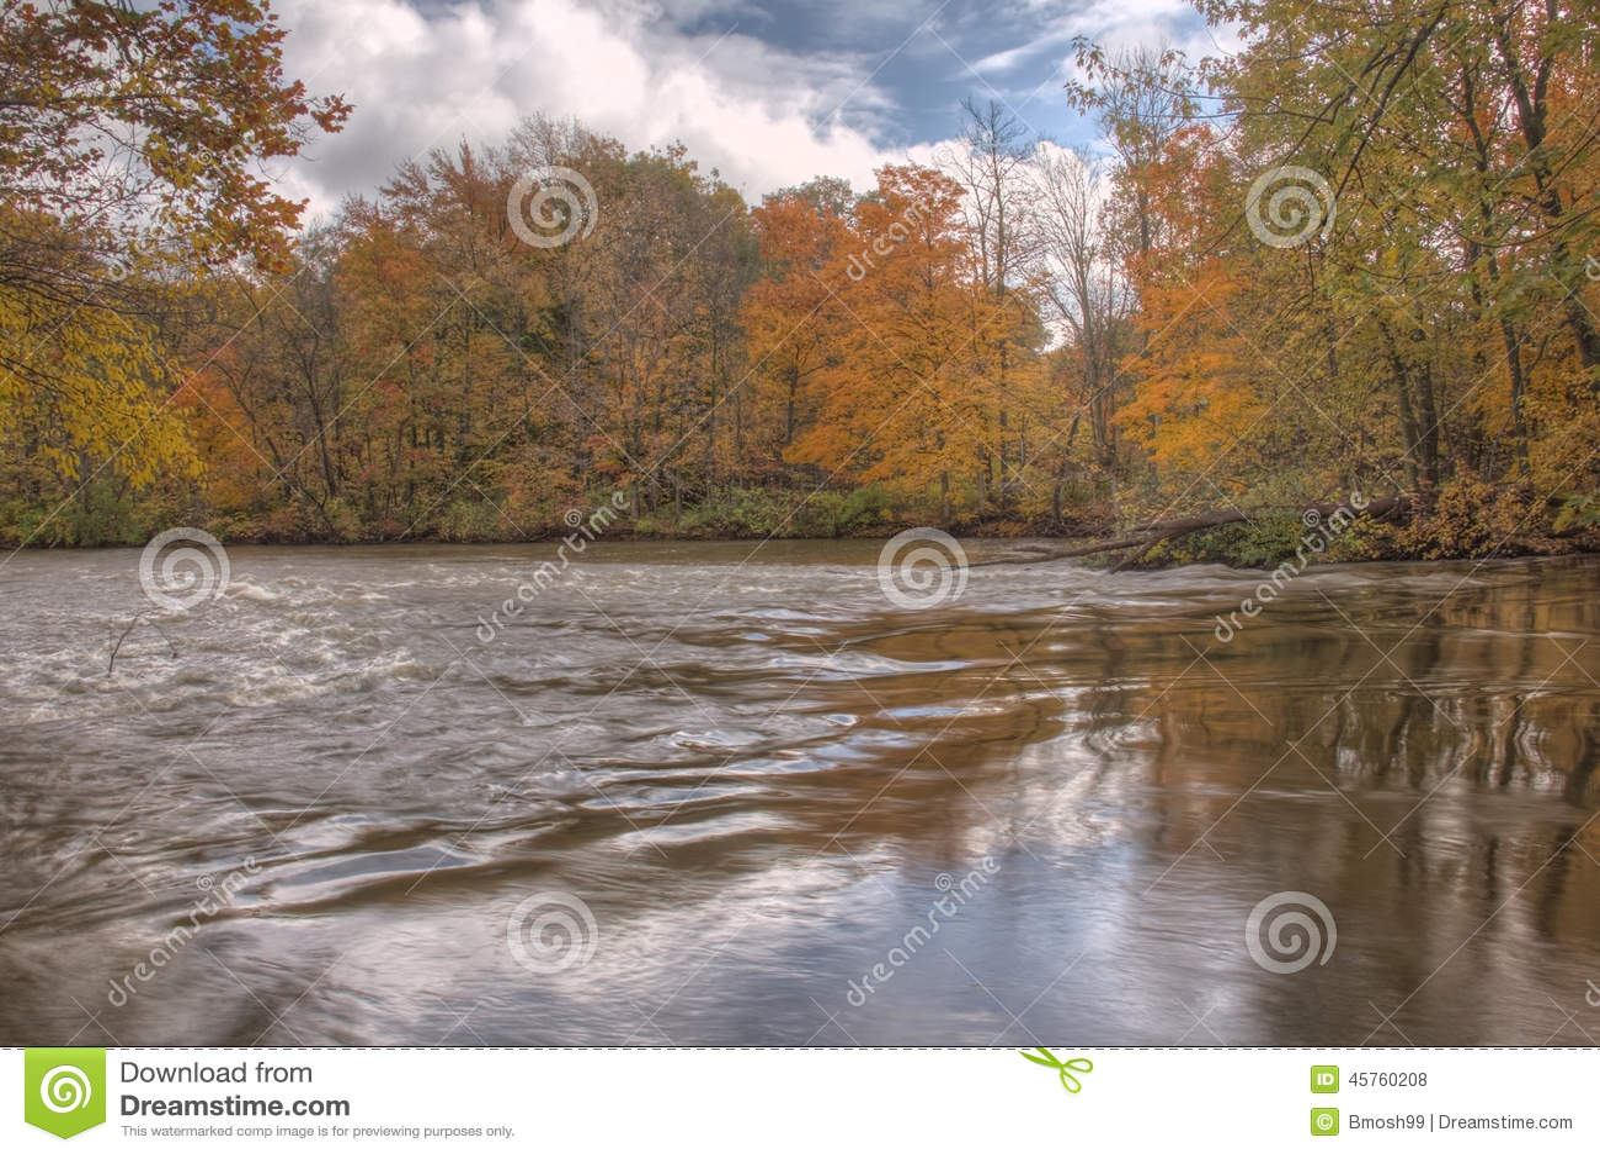 Thornapple River In Alaska, Michigan Stock Photo - Image of